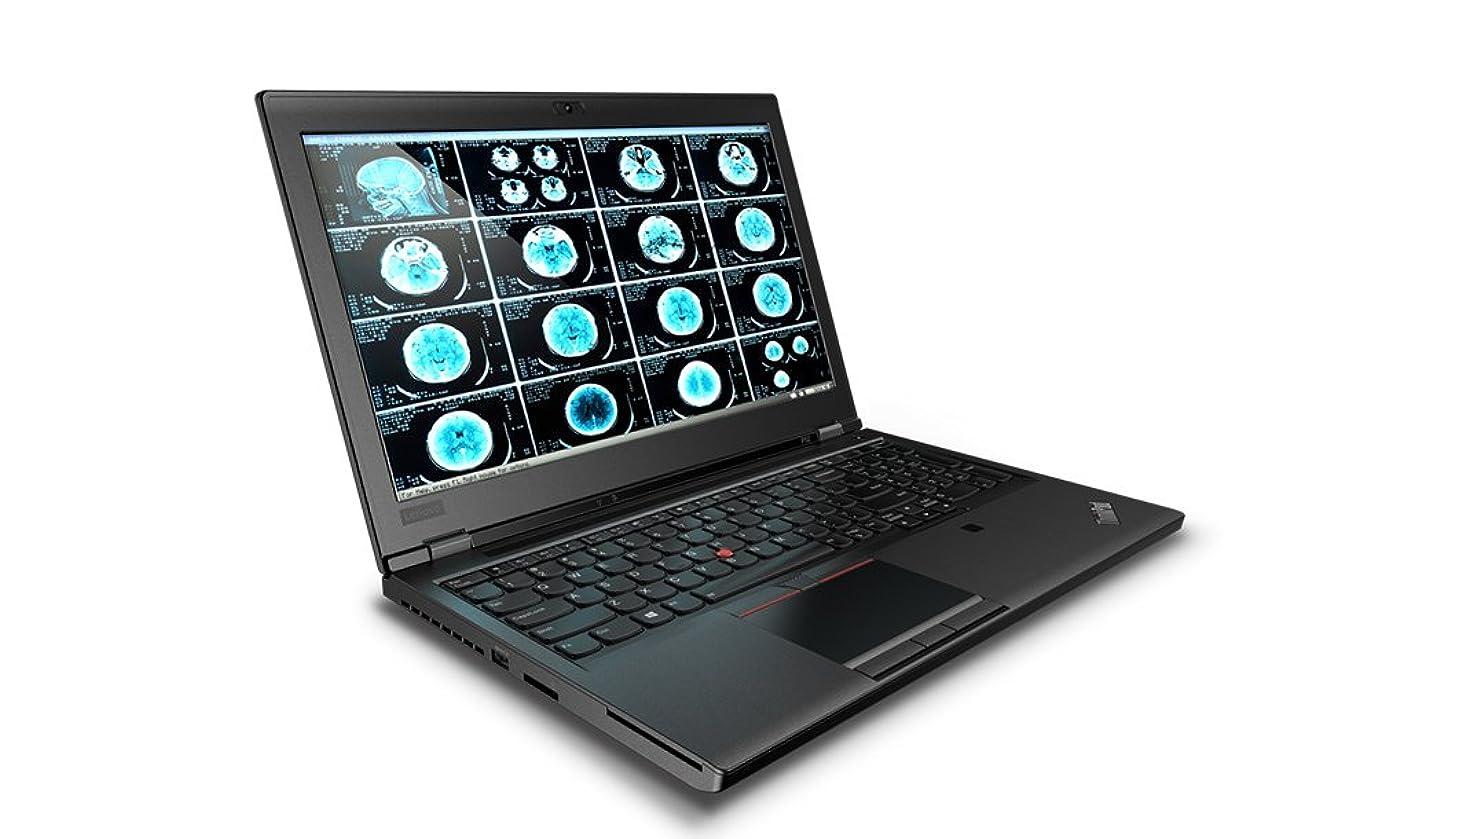 LA ThinkPad P52 Business Notebook: Intel 8th Gen i7-8750H, 32GB RAM, 512GB PCIe NVMe M.2 SSD, 15.6